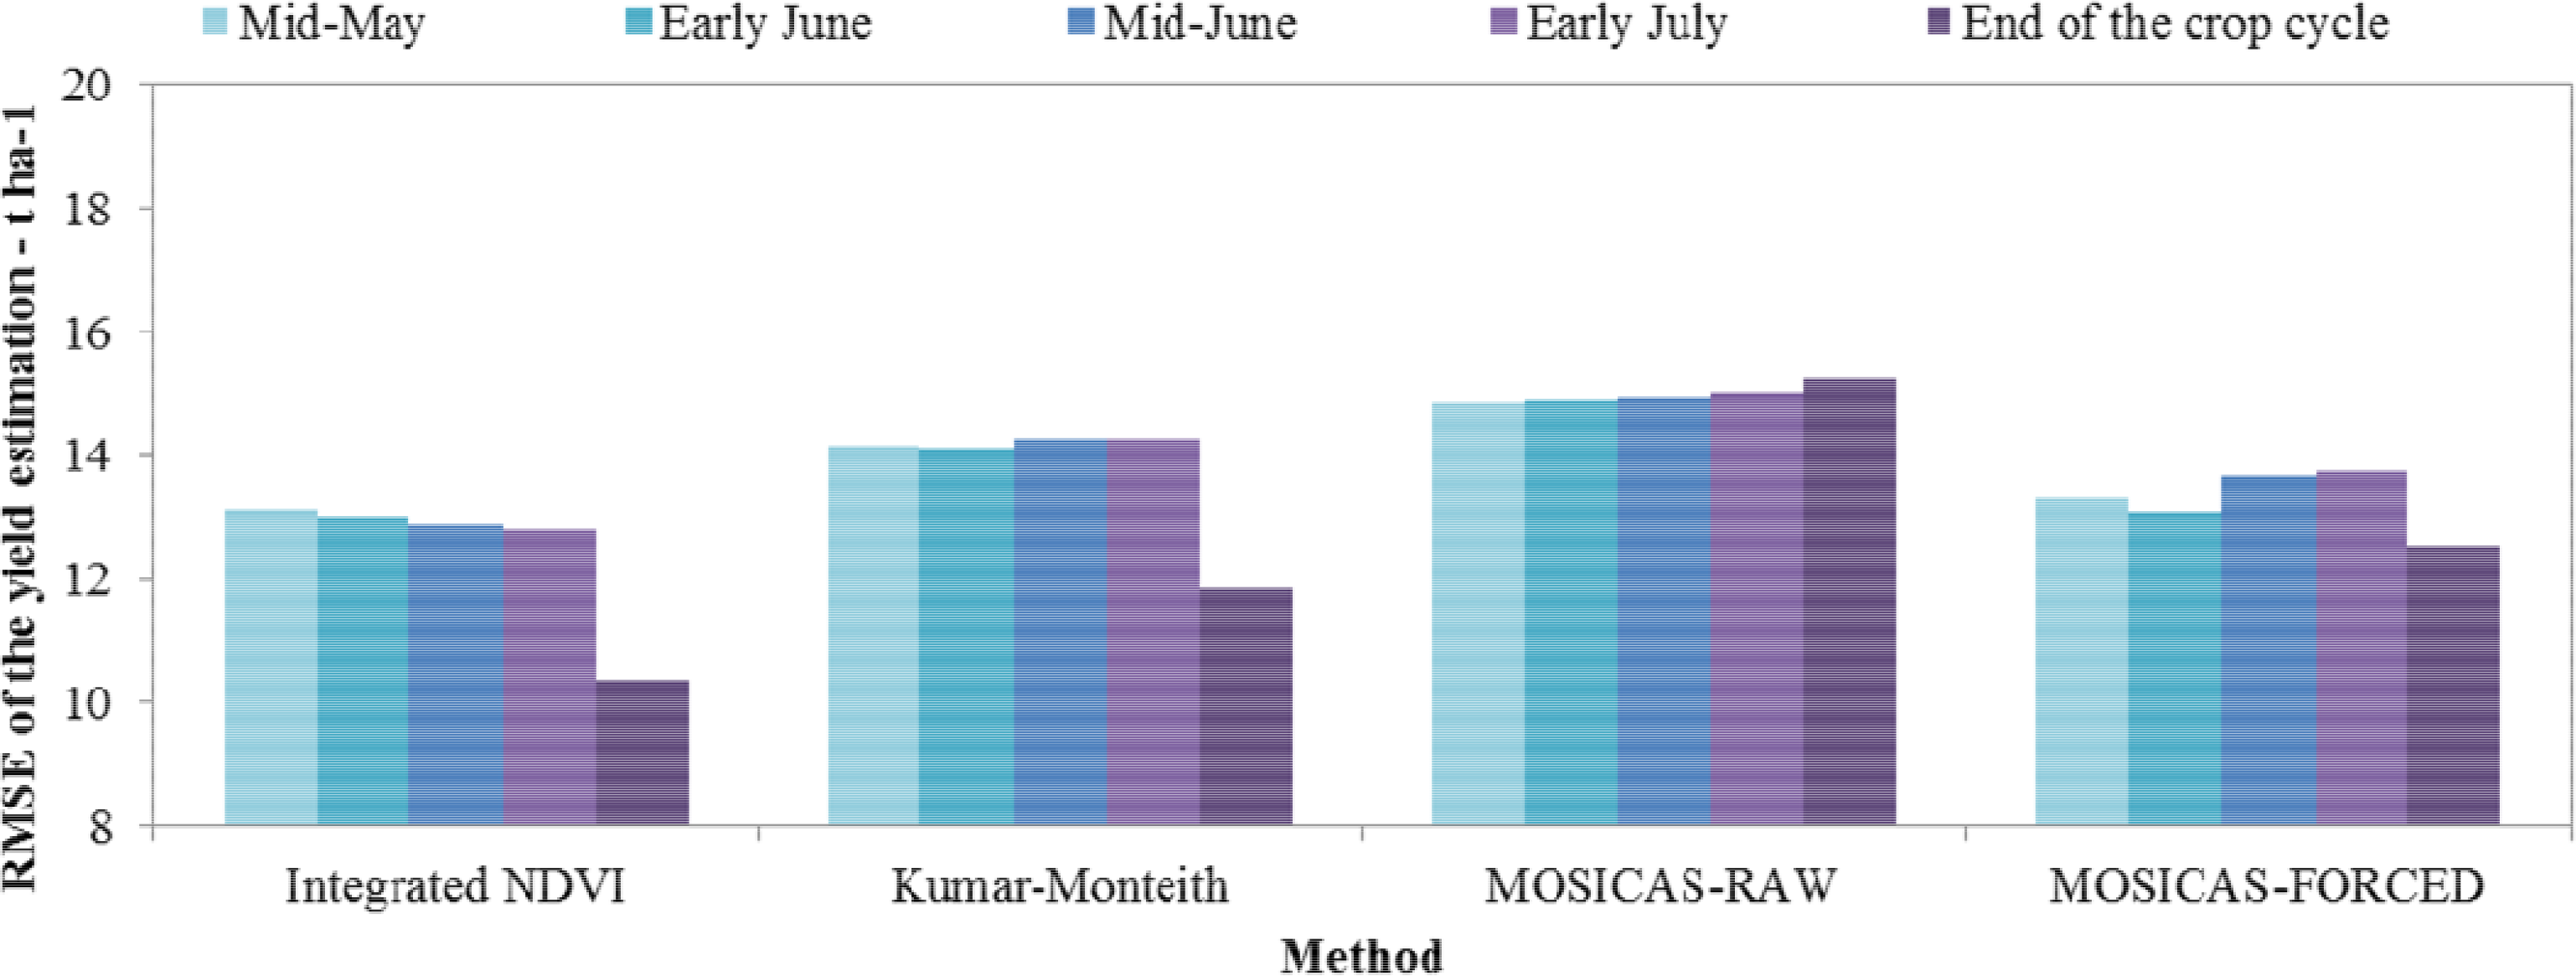 forecasting models for yield estimation Satellite remote sensing and gis based crops forecasting & estimation system in pakistan ijaz ahmad, abdul ghafoor, muhammad iftikhar bhatti ,ibrar-ul hassan akhtar.